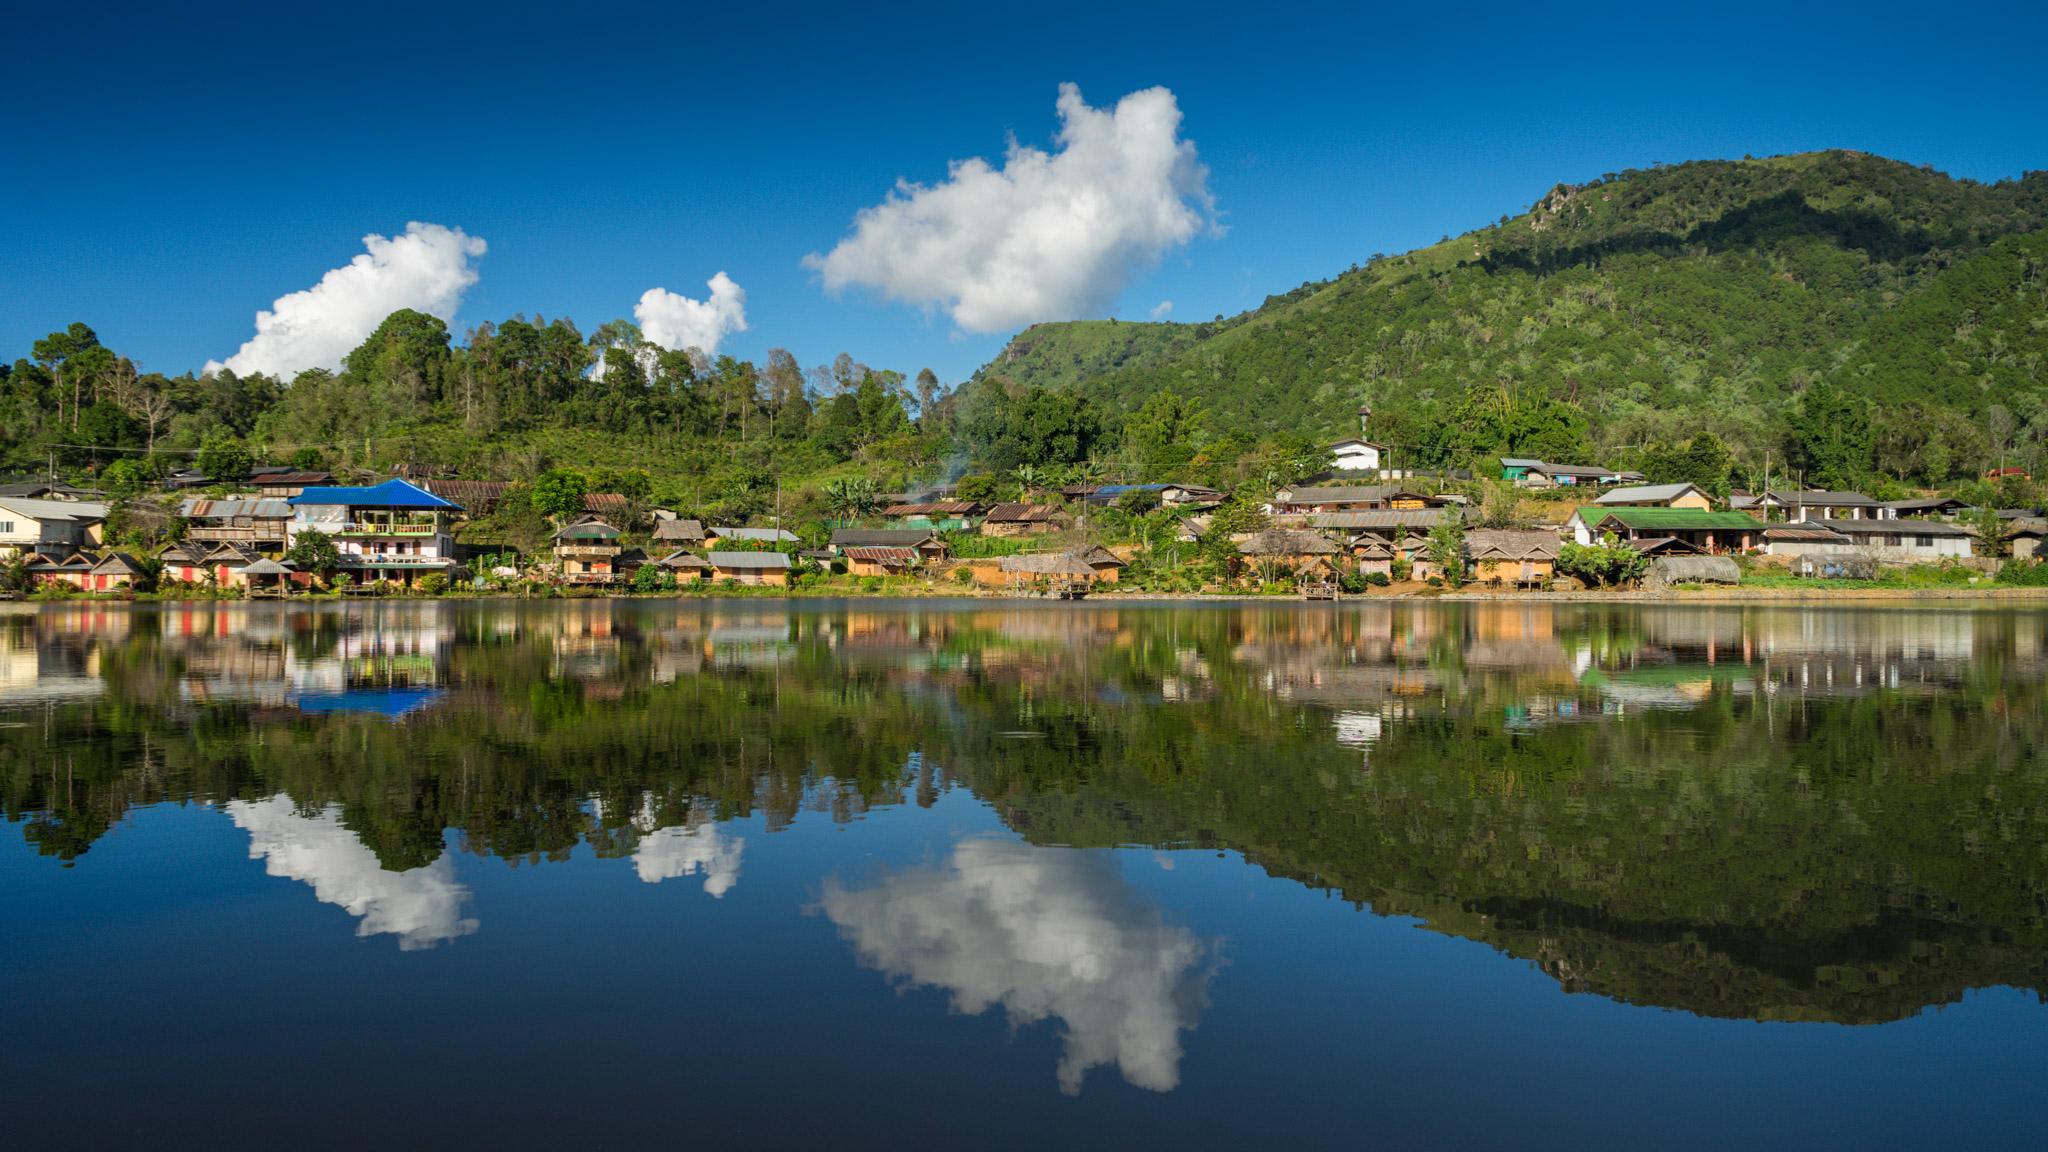 village chinois au nord de la Thaïlande